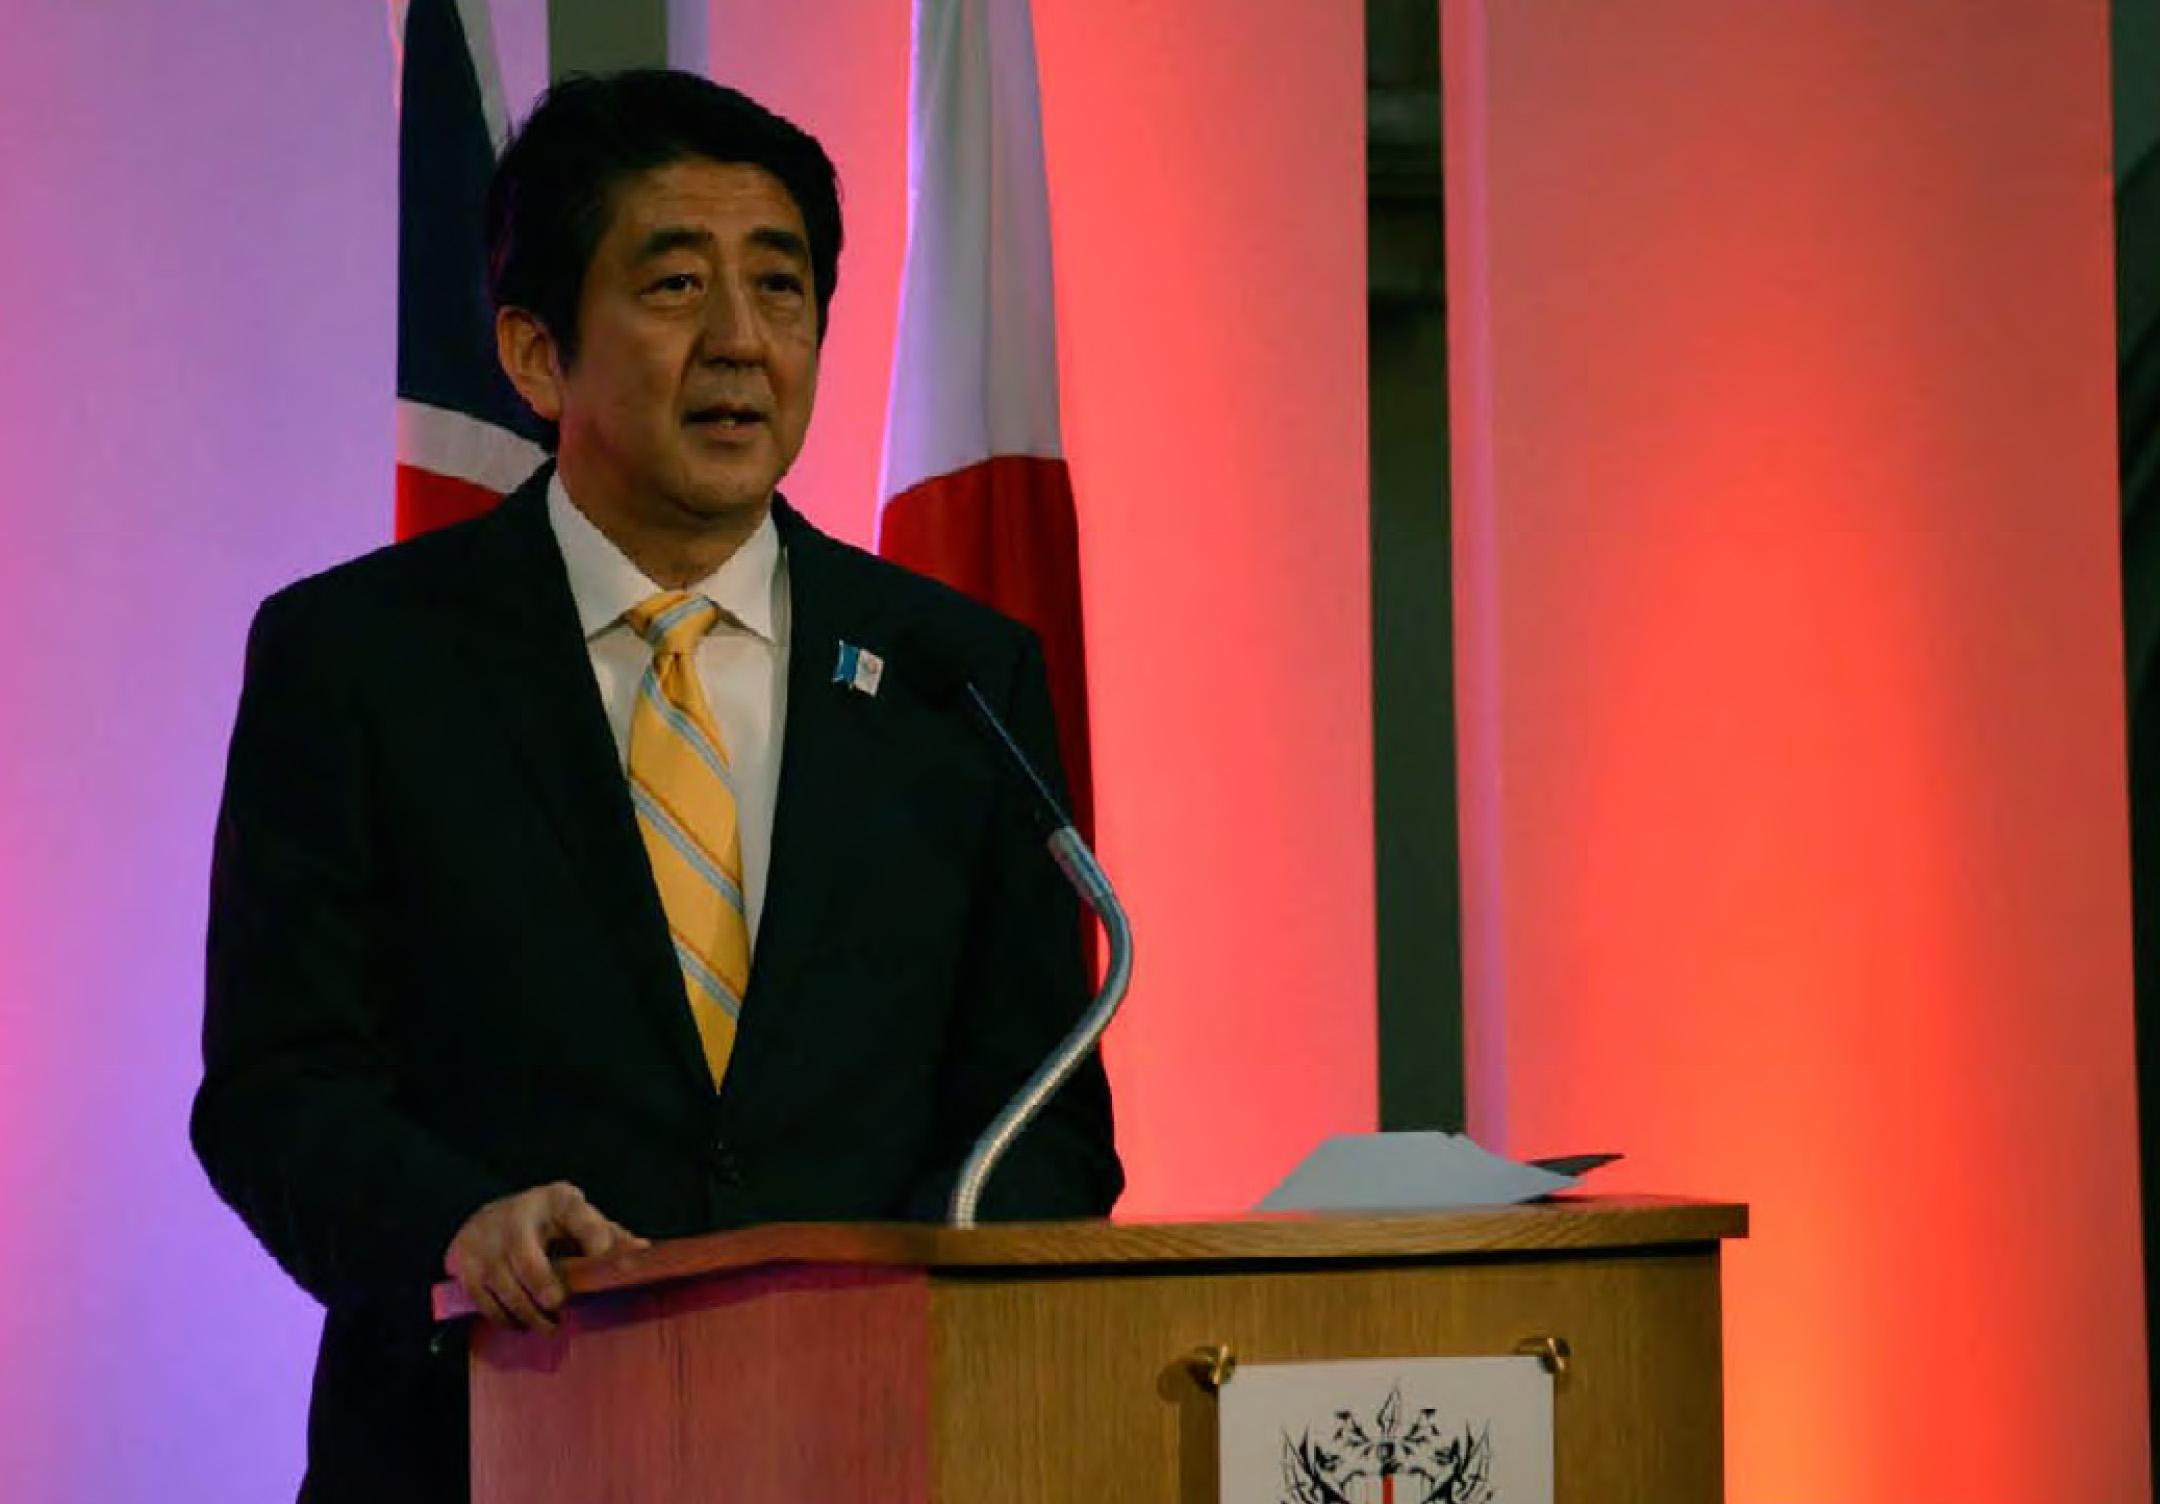 JAPAN PlEDGES US $ 7.73 bIllION fOR MYANMAR'S DEVElOPMENT